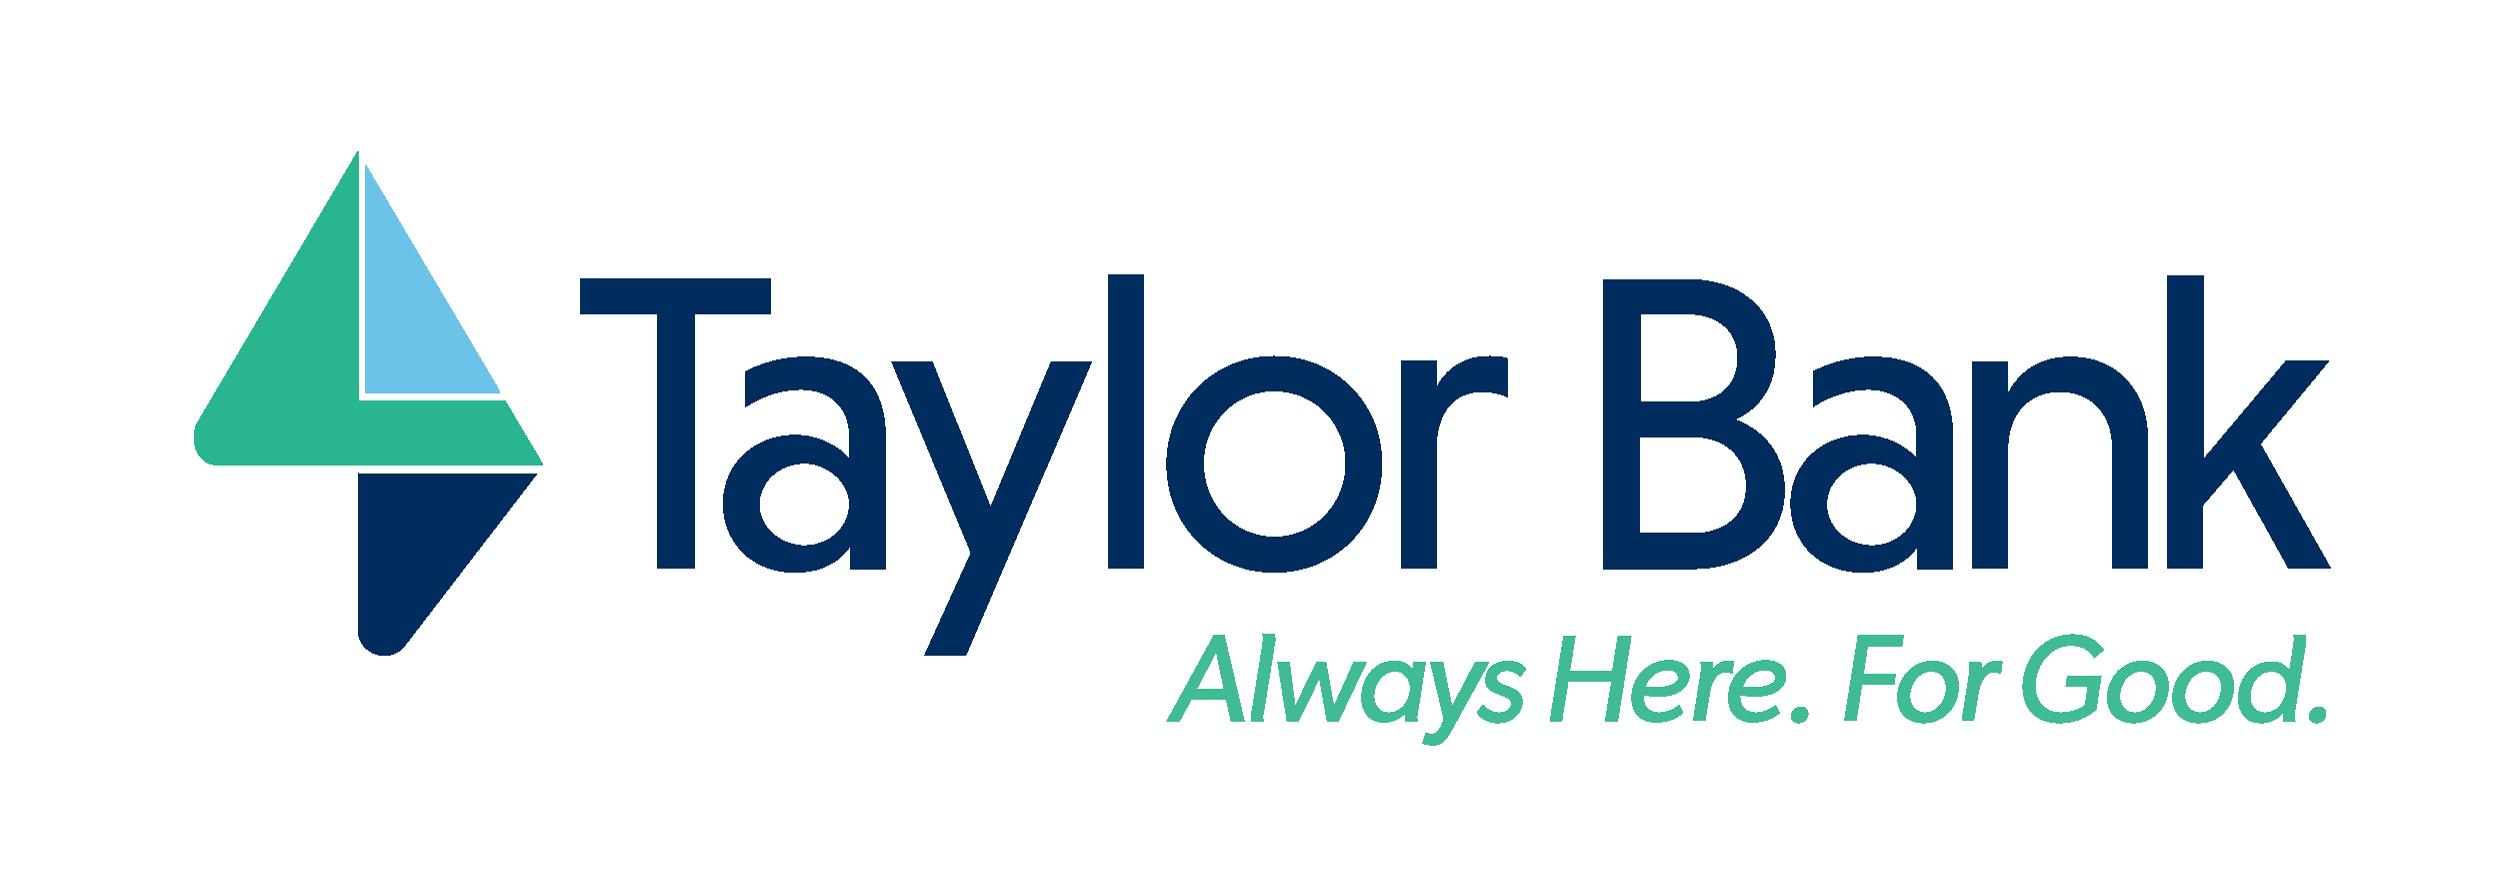 taylor-bank-tagline-logo.png